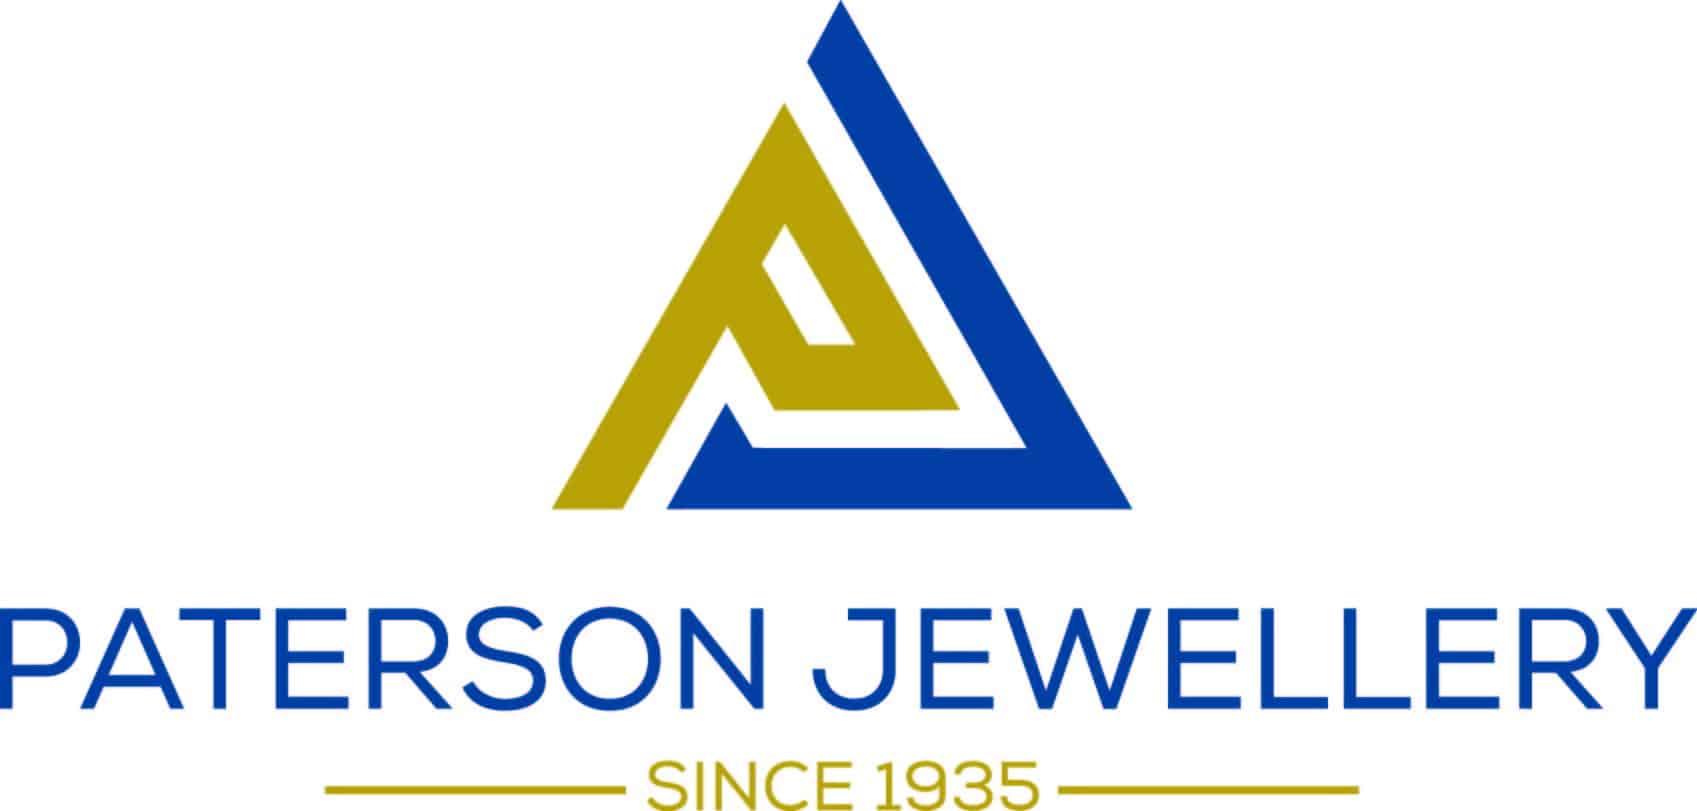 Paterson Jewellery